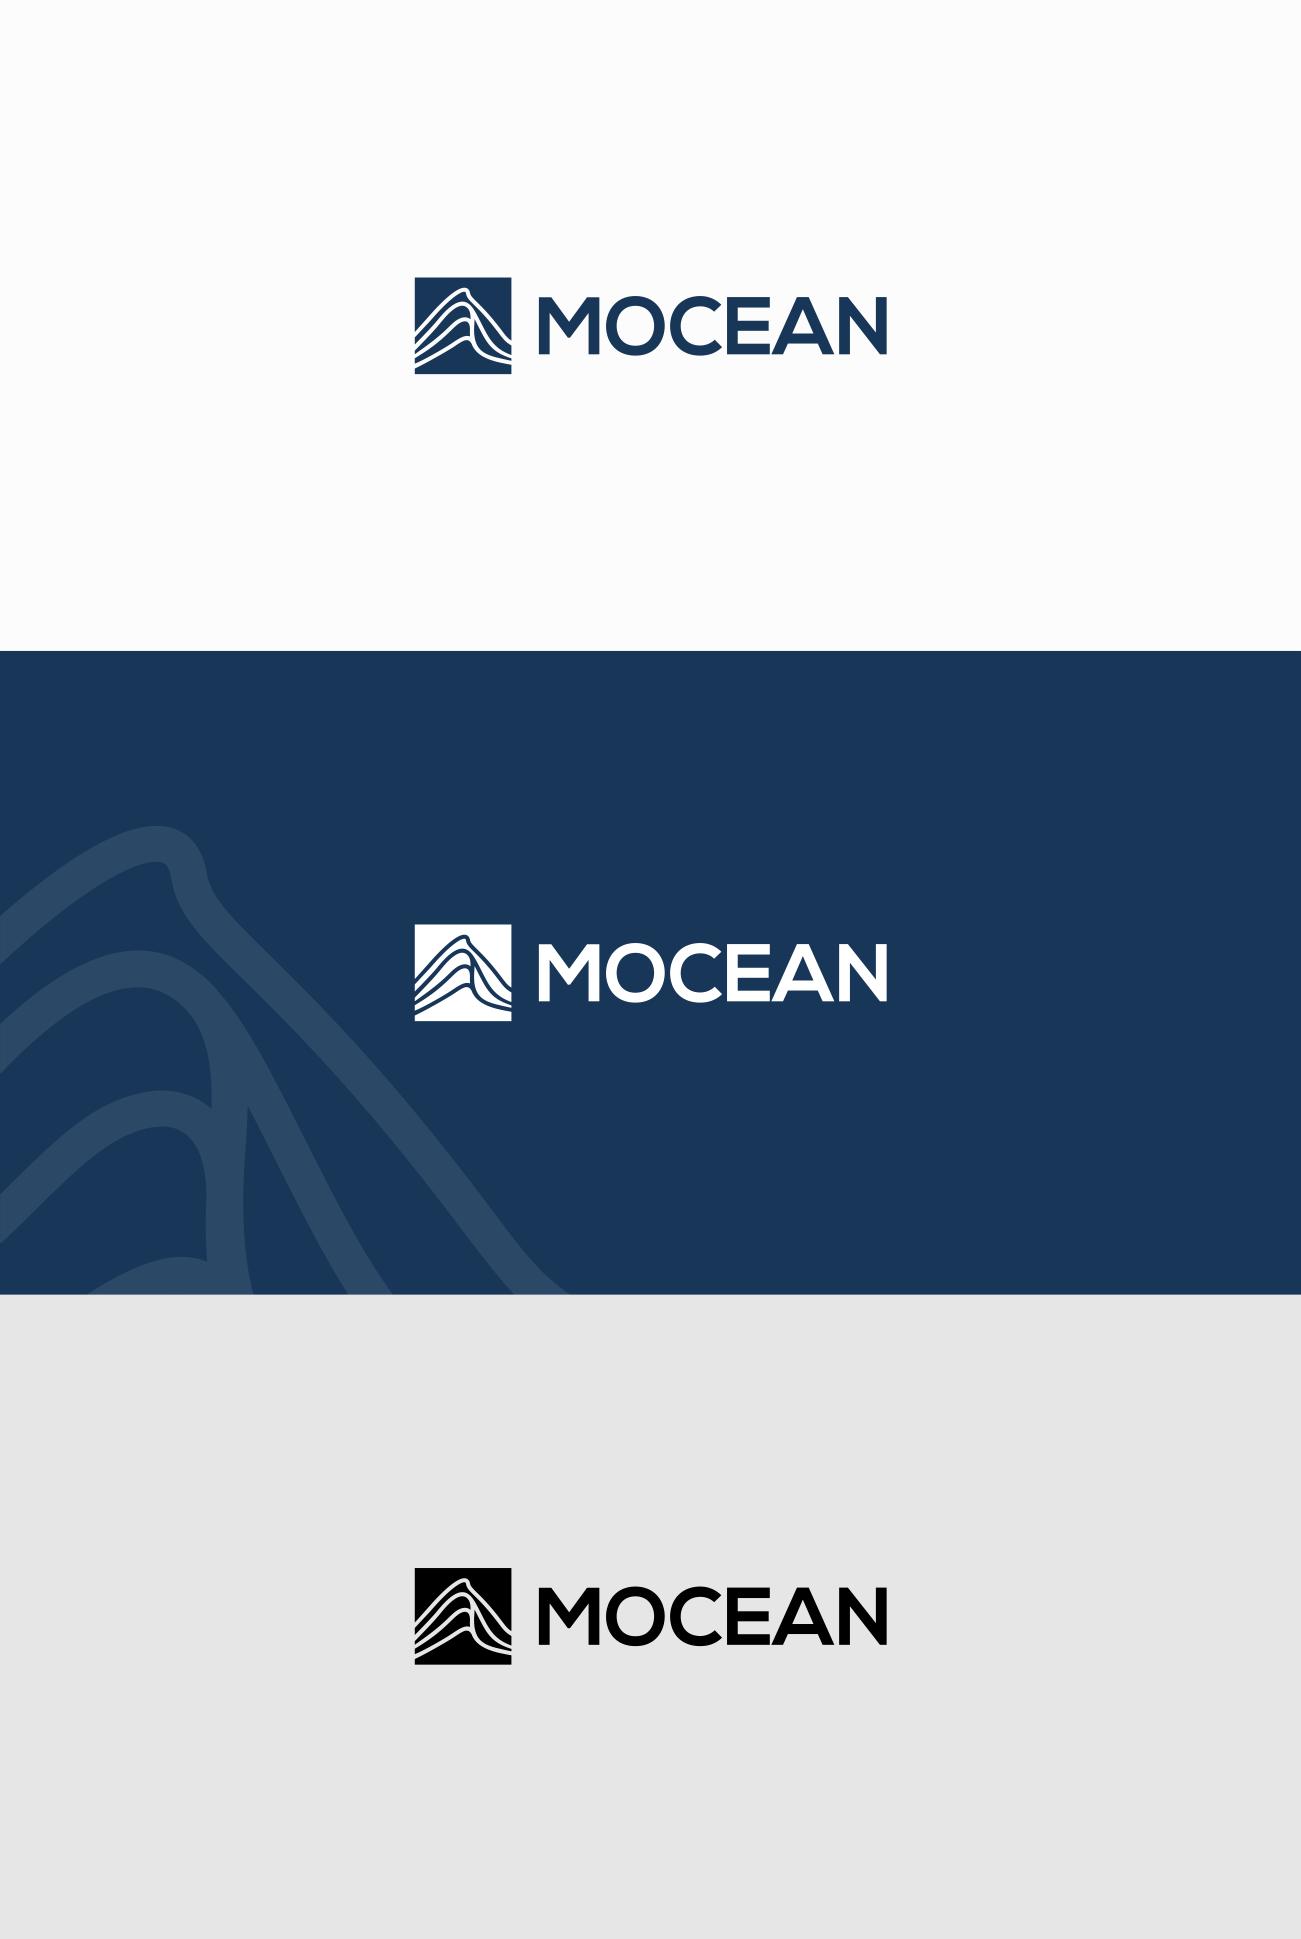 Name change on existing logo